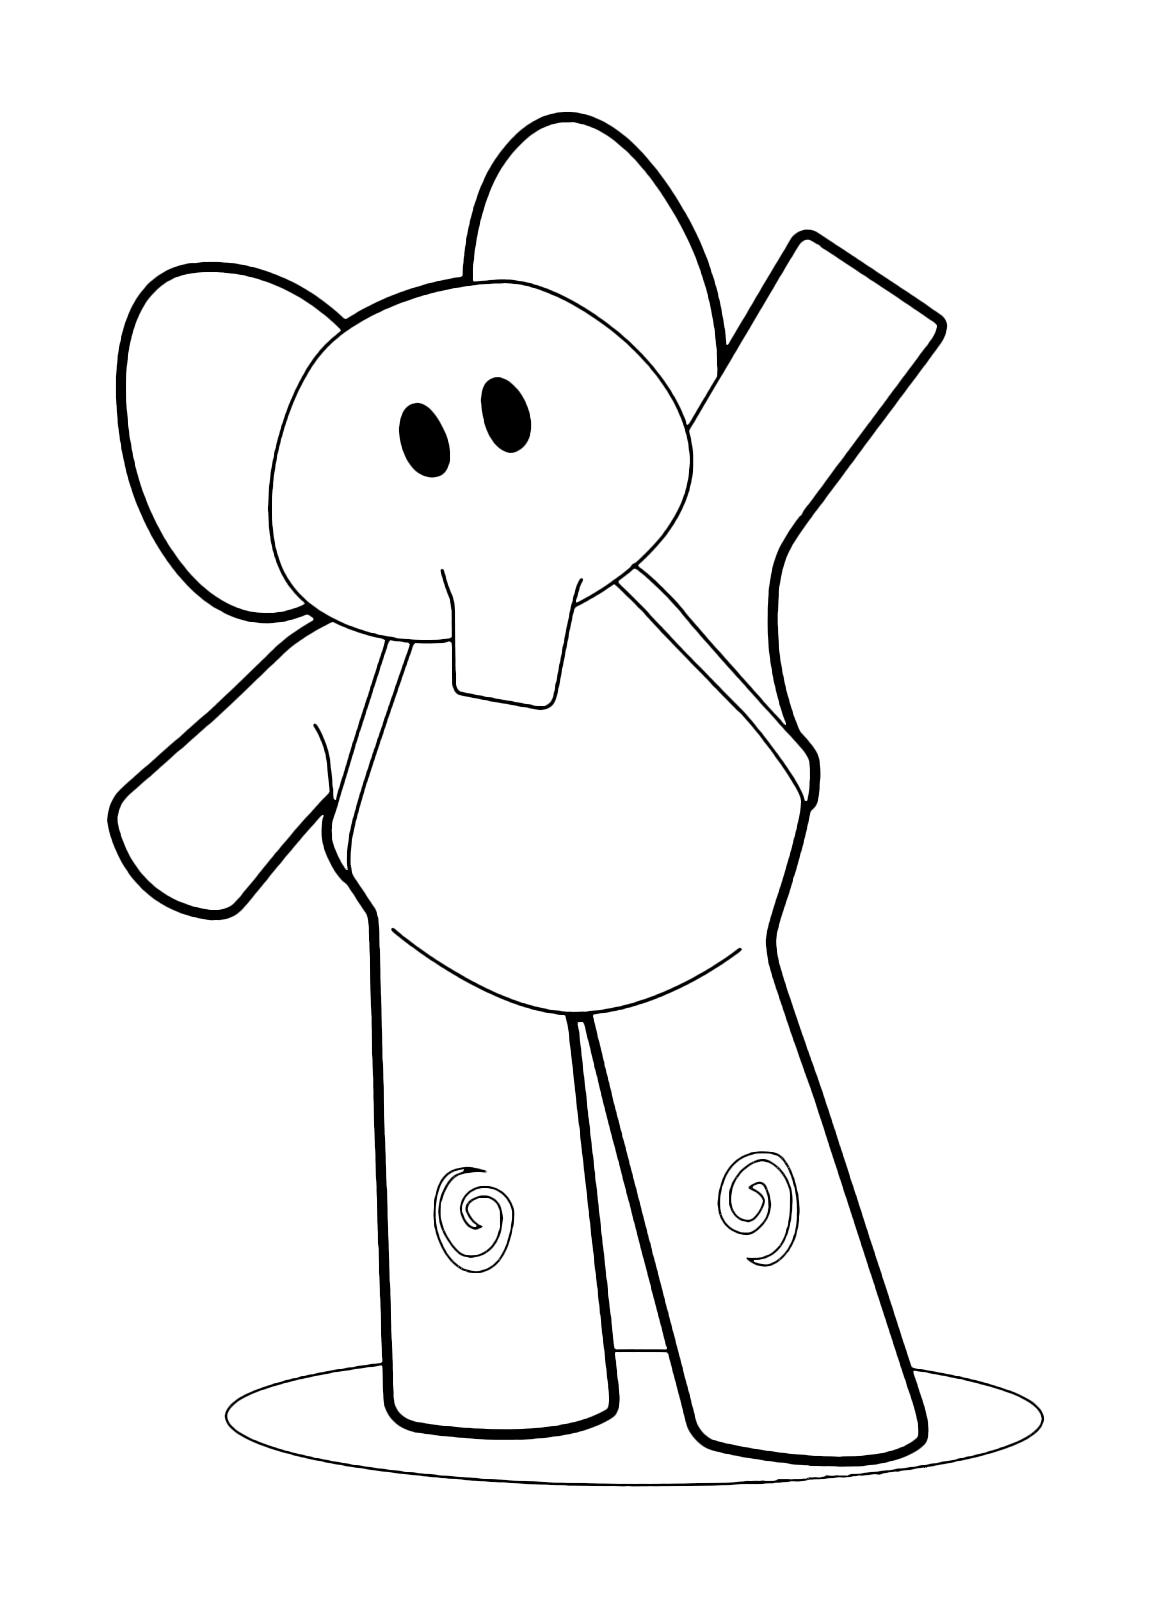 Pocoyo - Elly saluta